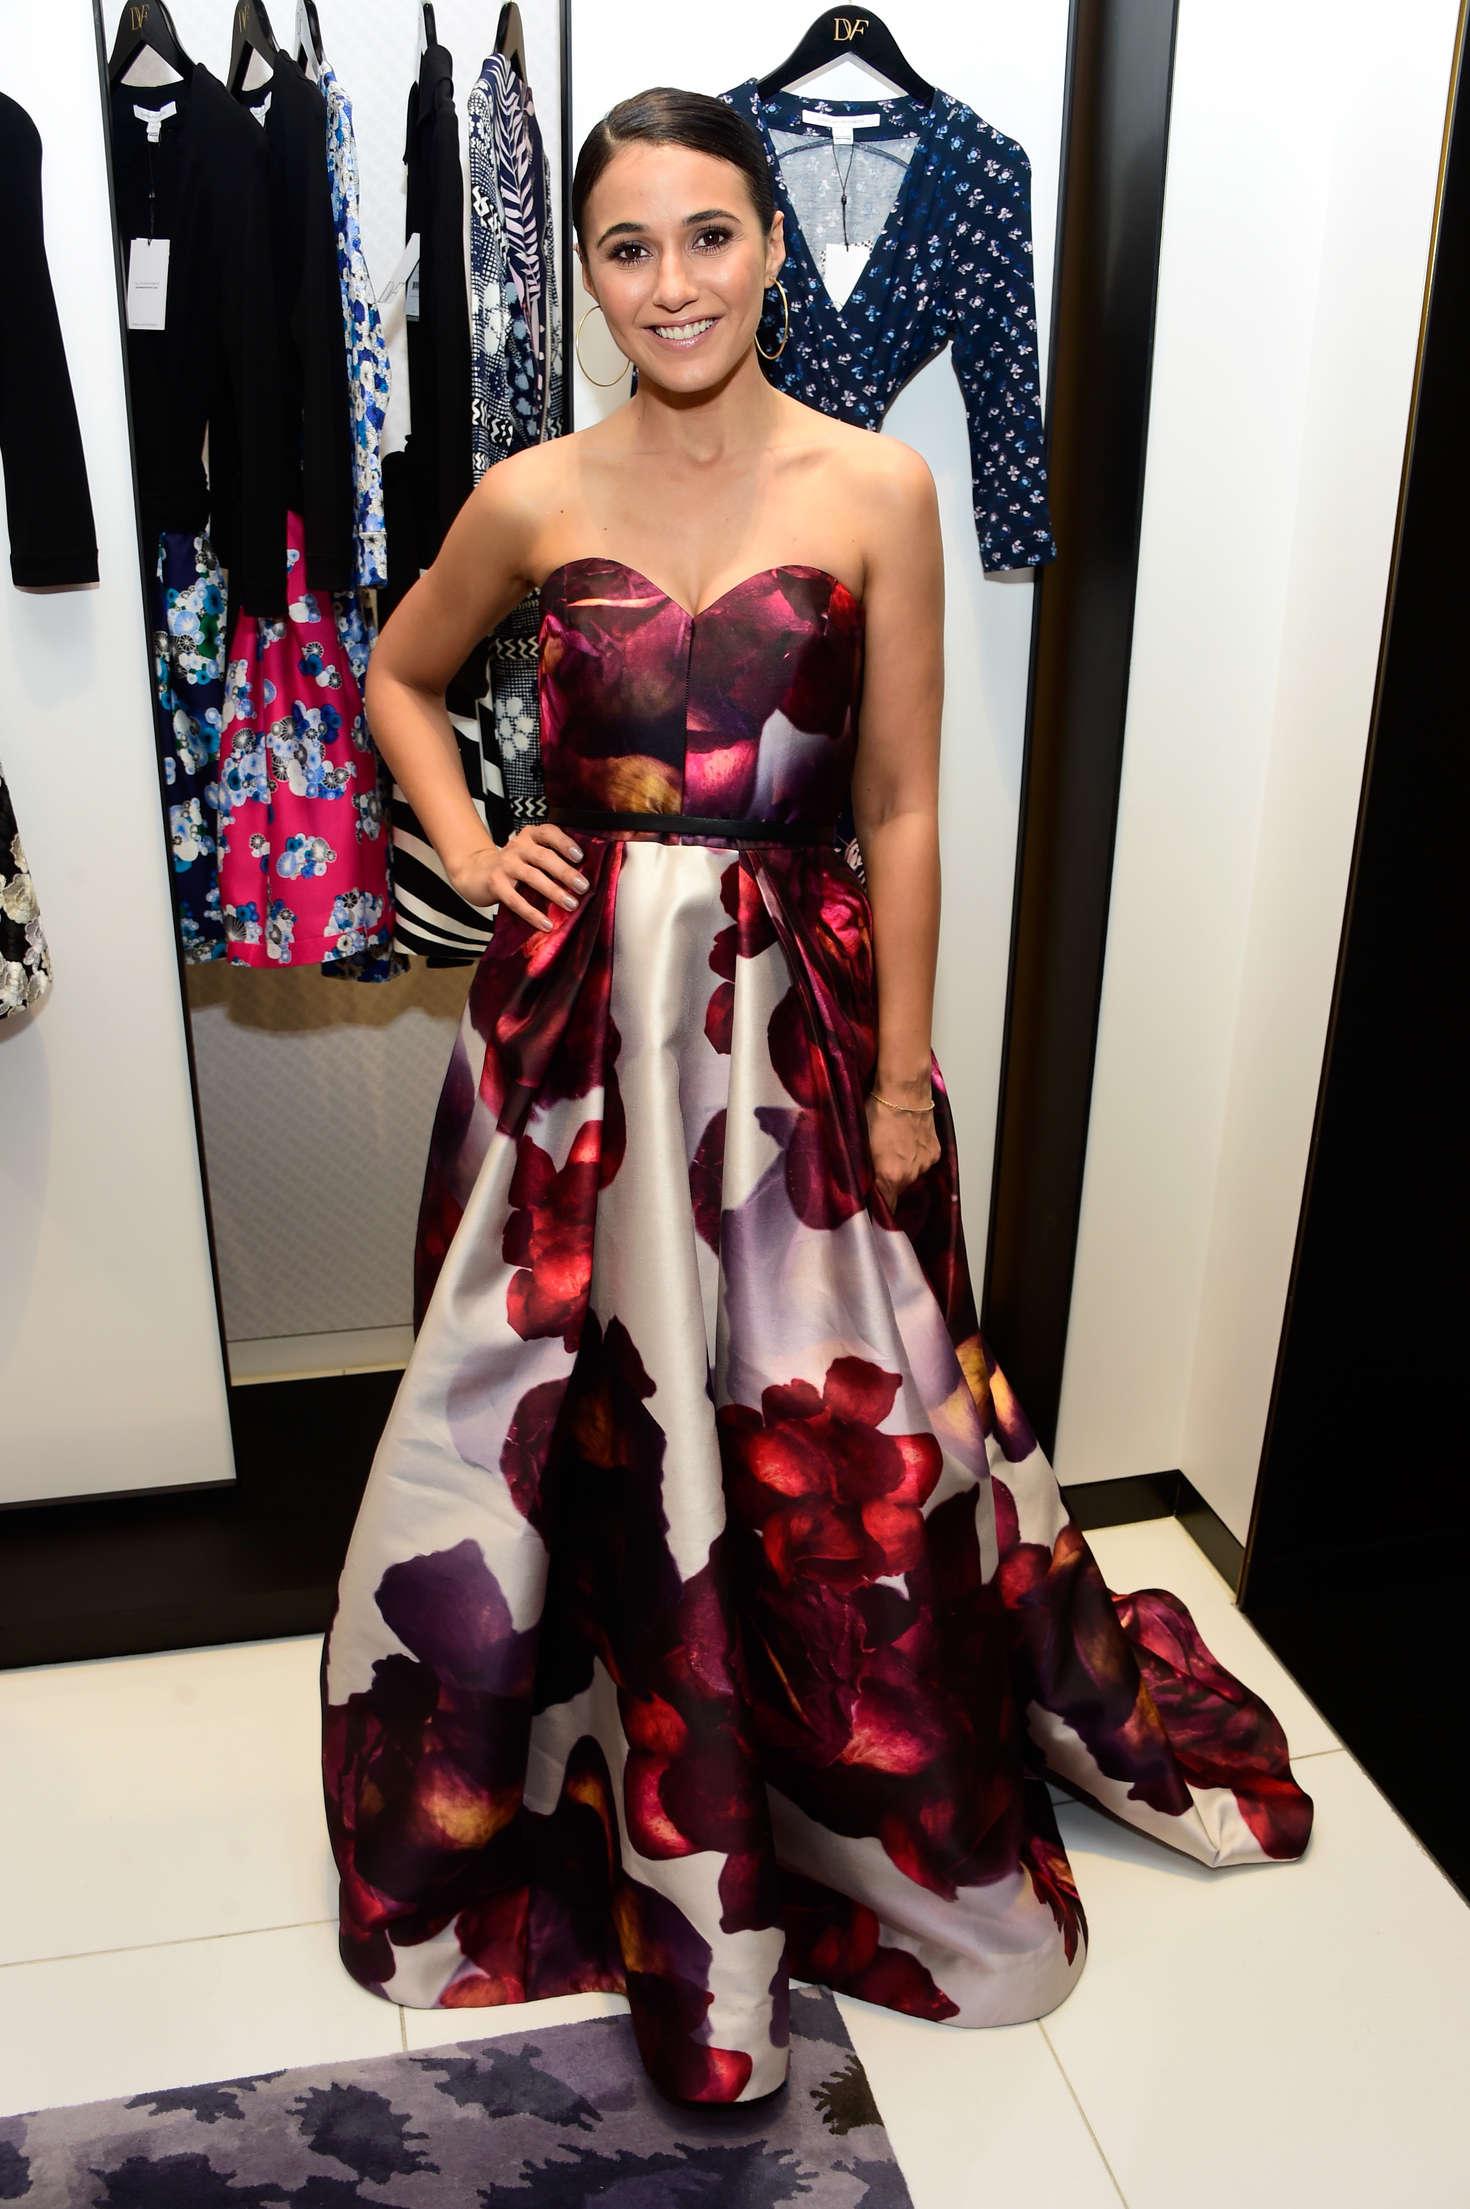 Emmanuelle Chriqui - Shopping Event at Diane von Furstenberg in LA